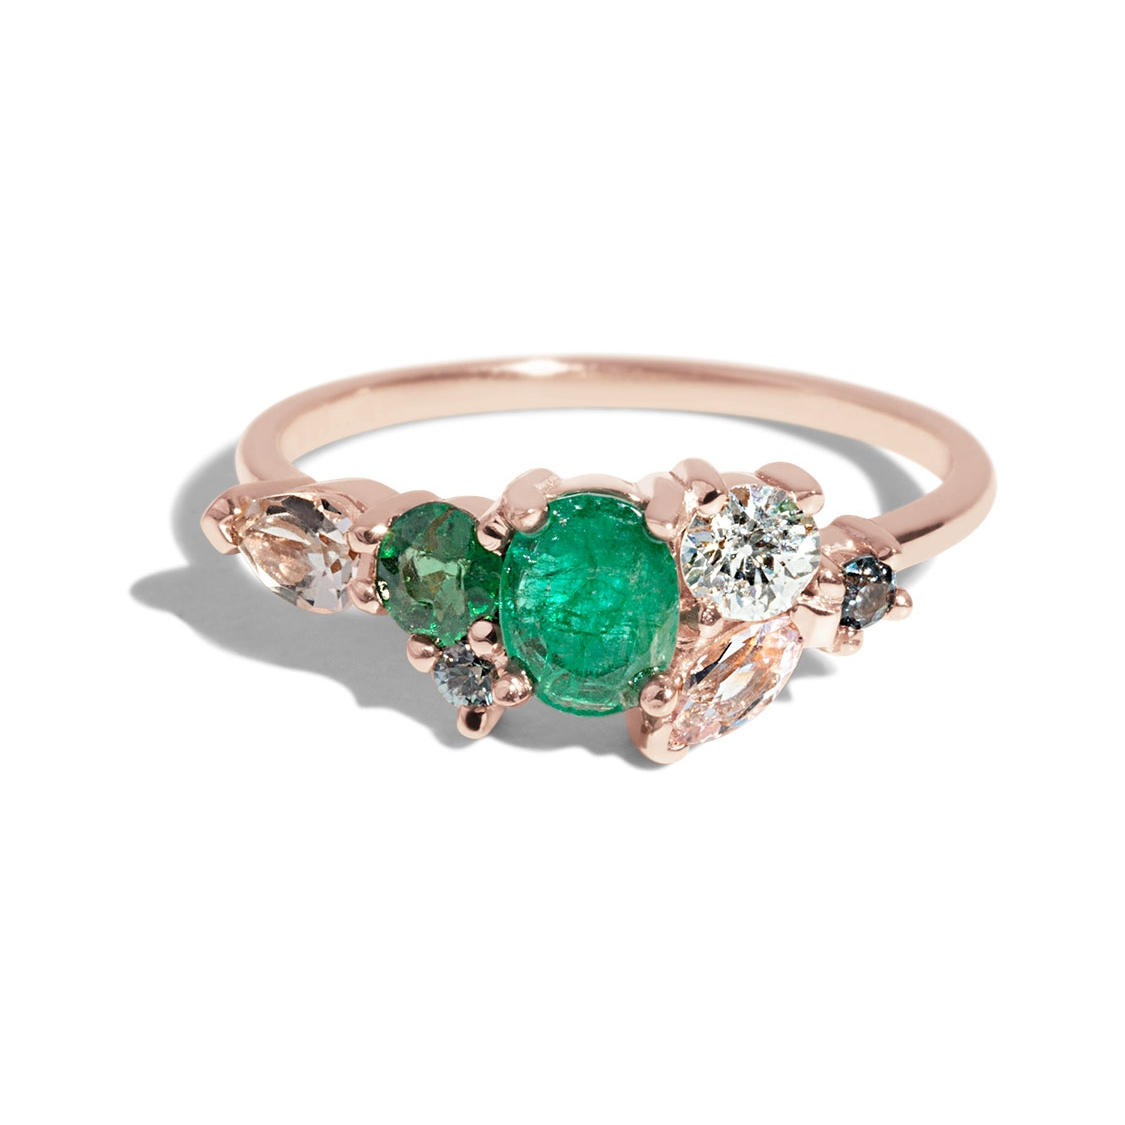 Bario Neal Custom Heirloom Emerald and Morganite Cluster Ring